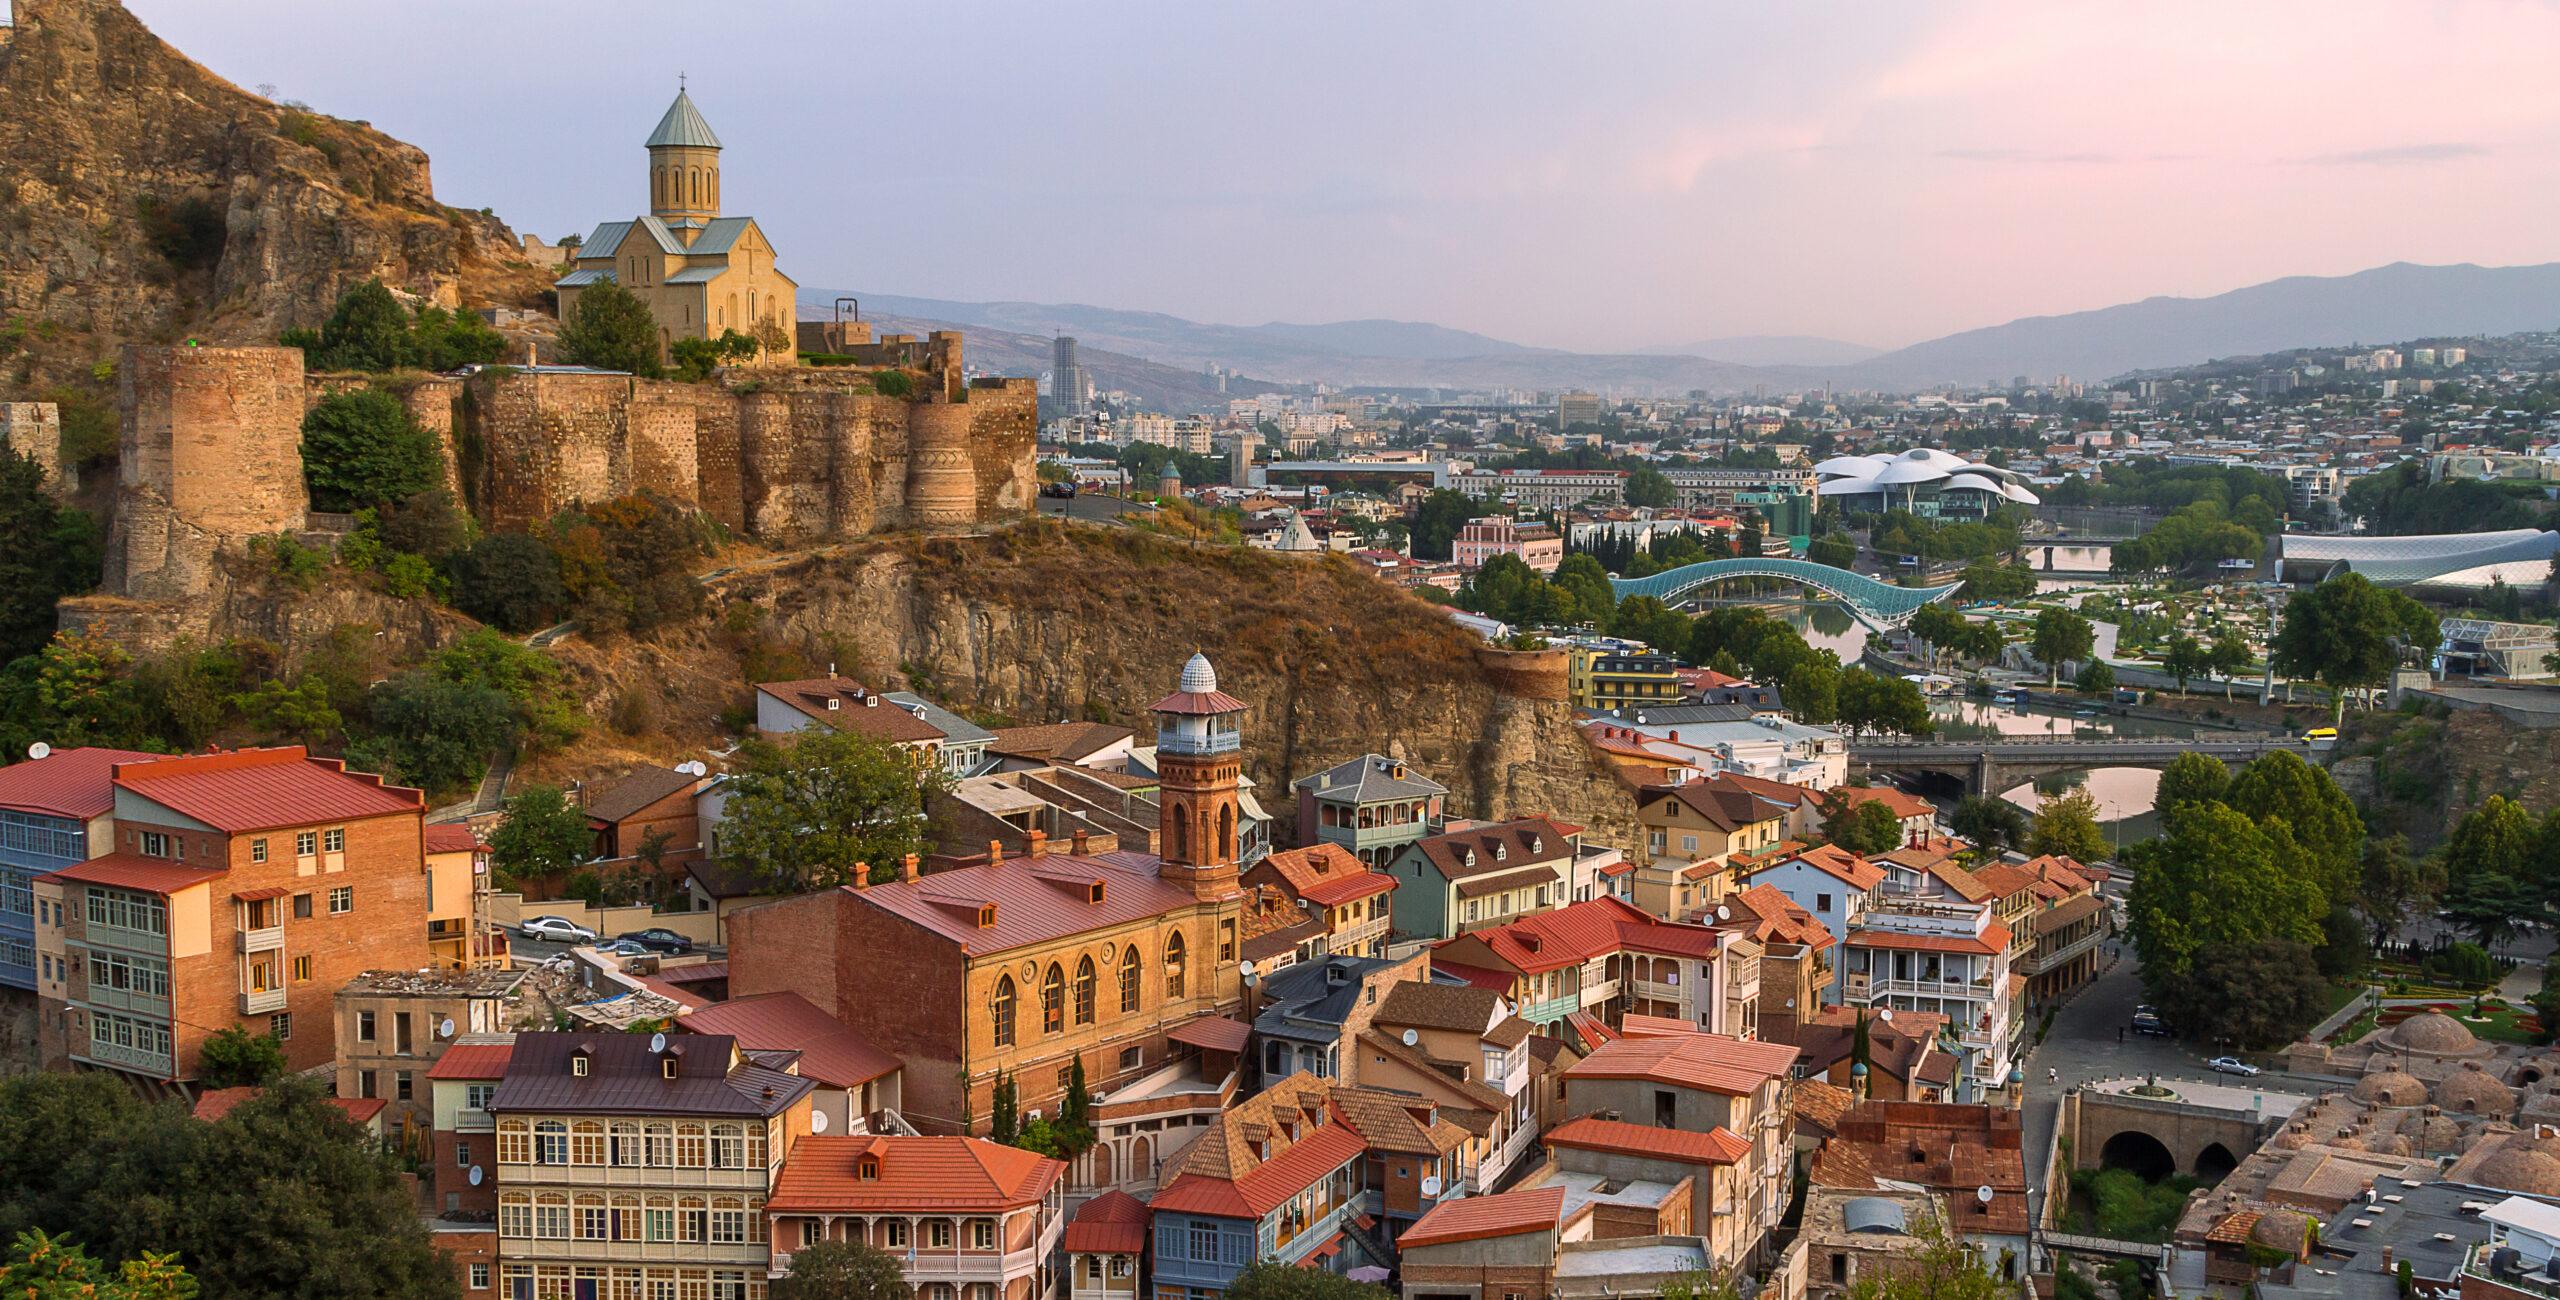 Skyline of Tbilisi and Narikala Castle, Tbilisi, Georgia. [Shutterstock Image]